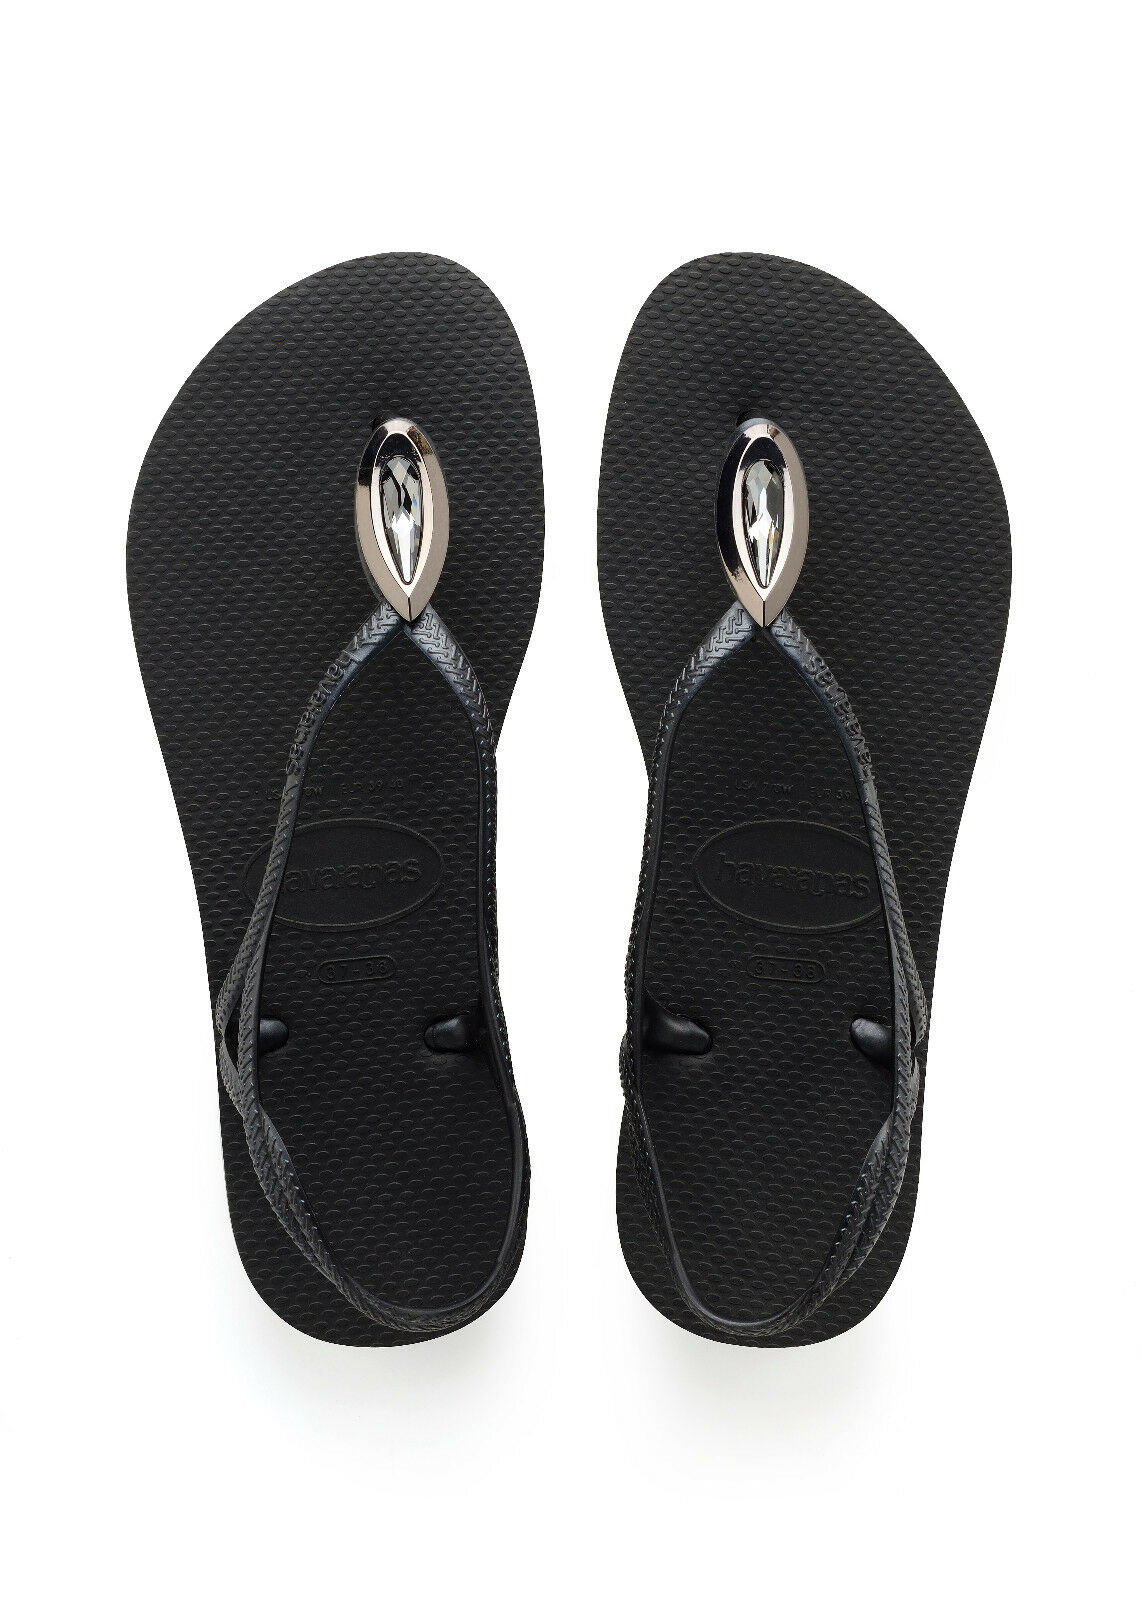 HAVAIANAS Zehentrenner Badeschuhe Thongs Sandale LUNA SPECIAL schwarz SO18 NEU